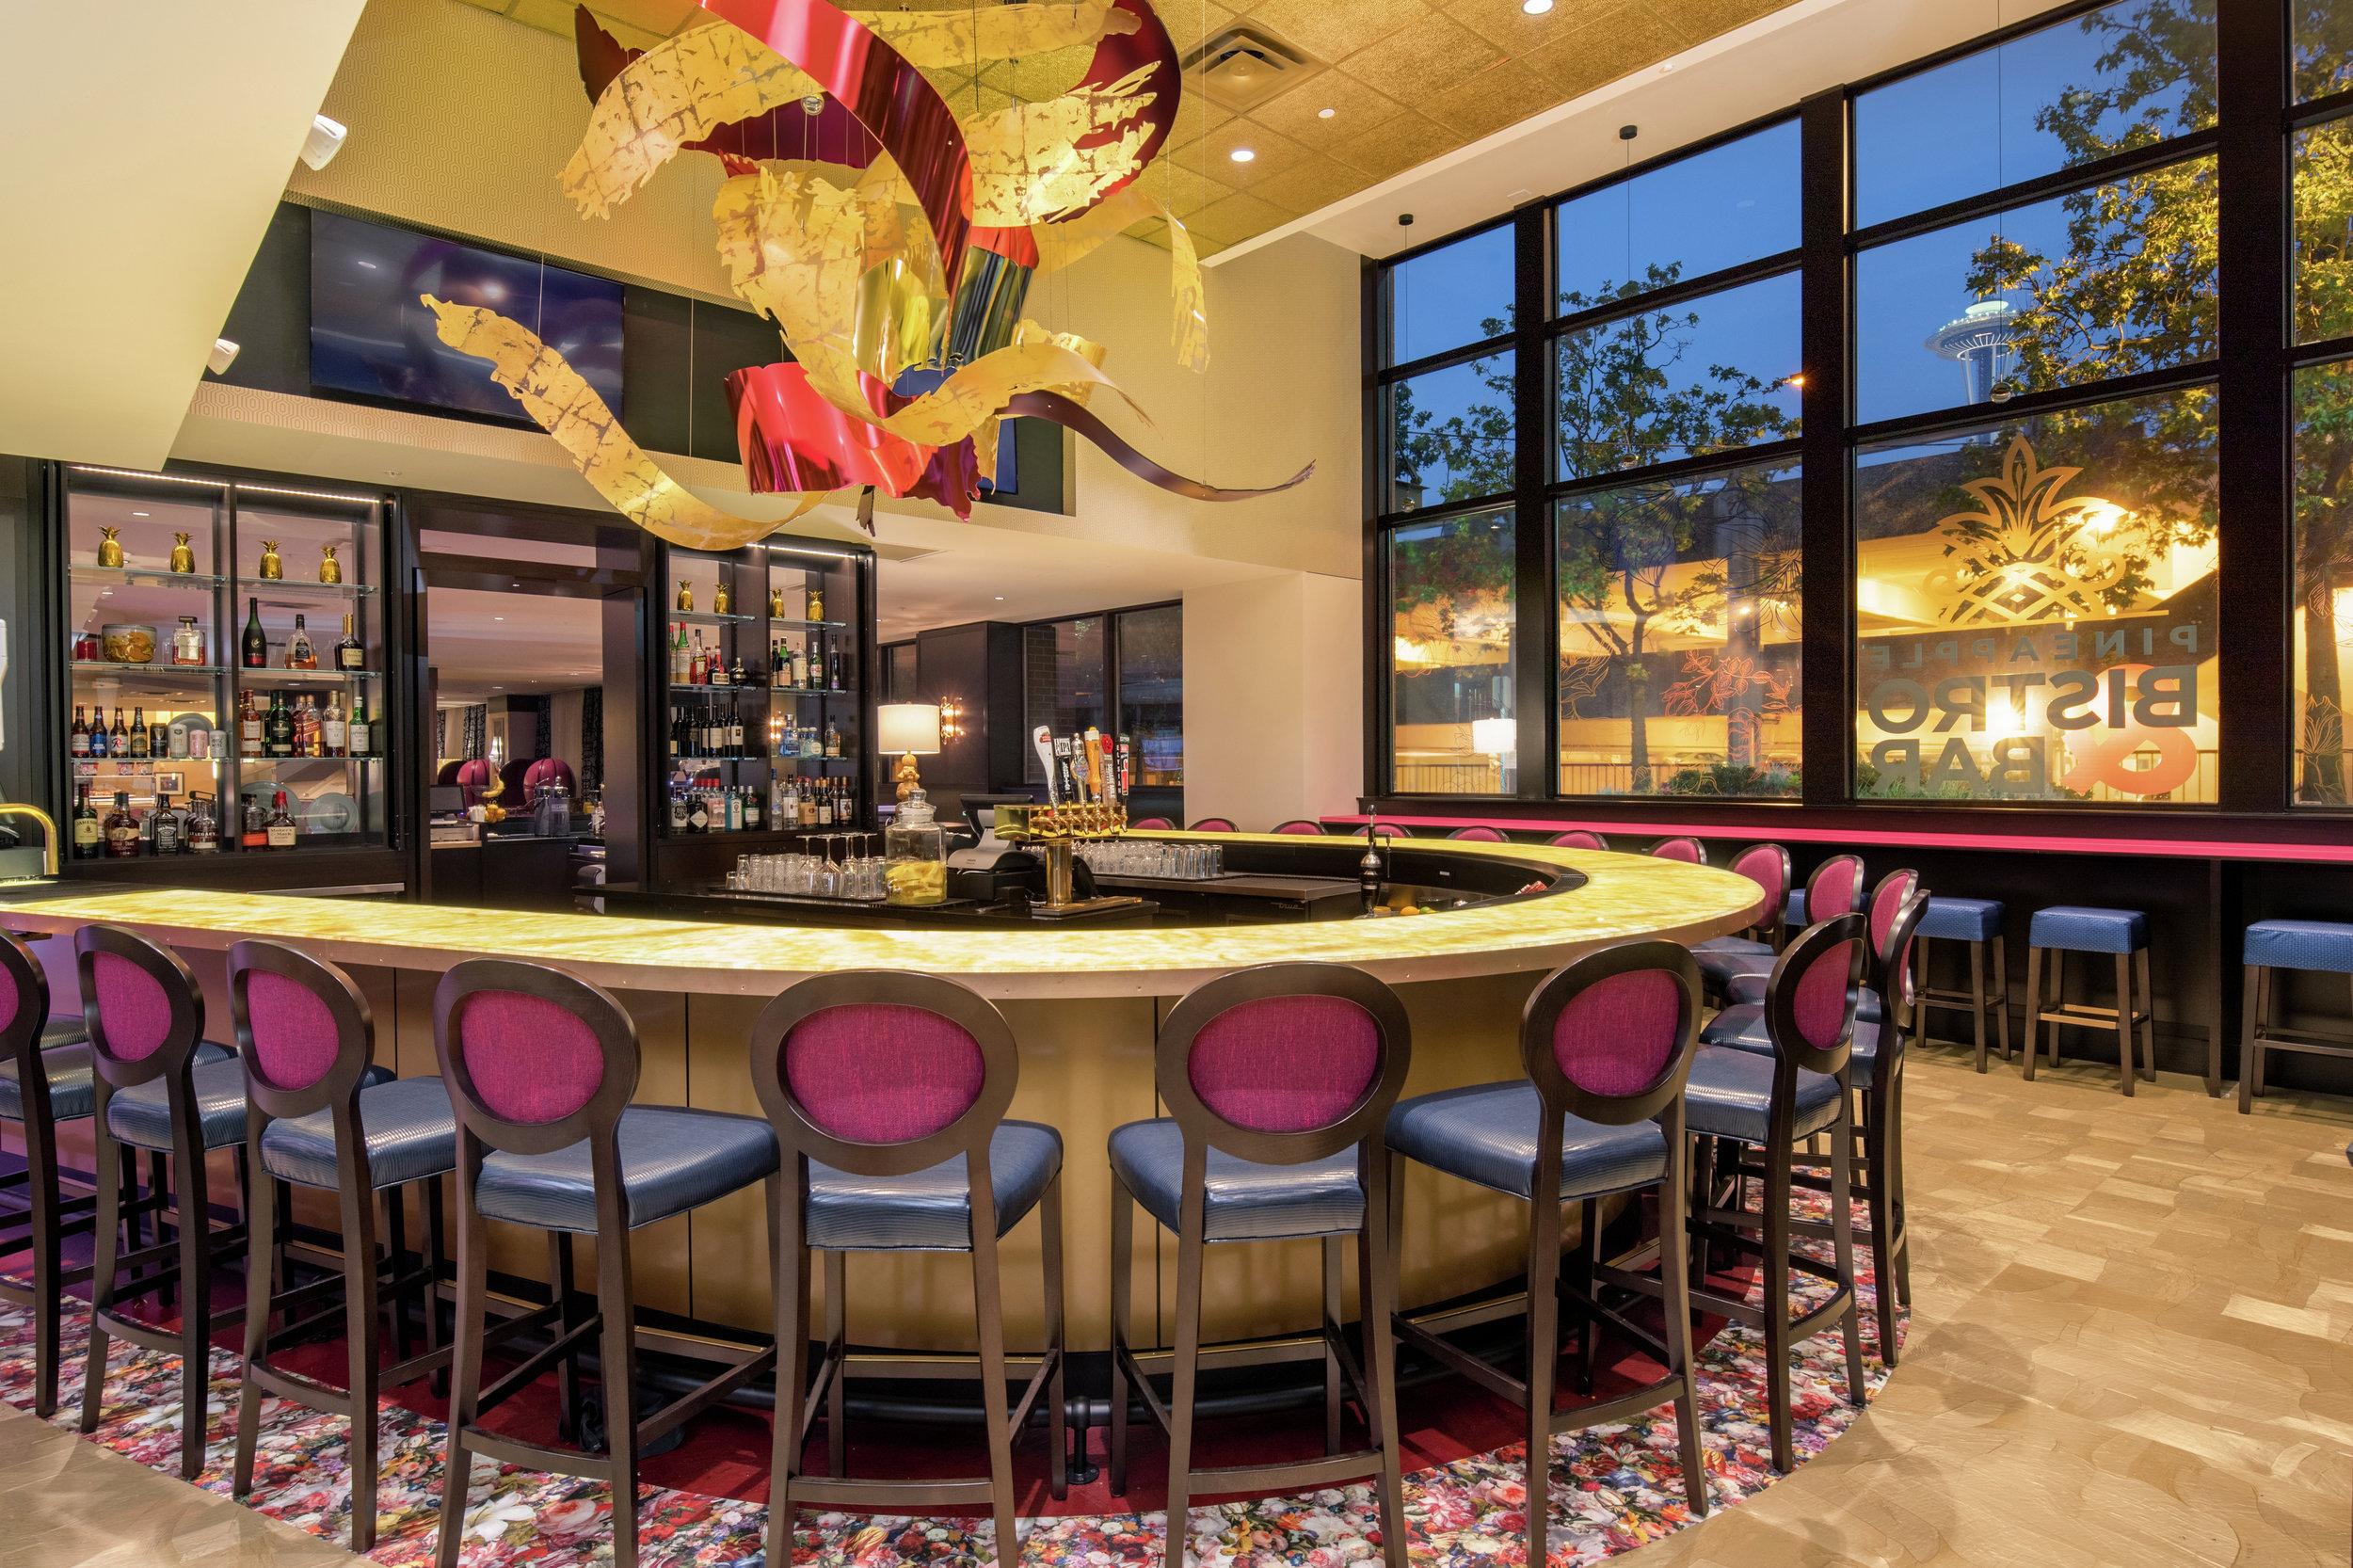 The Maxwell Hotel-Interiors-PBB-Bar-3500x2333.jpg